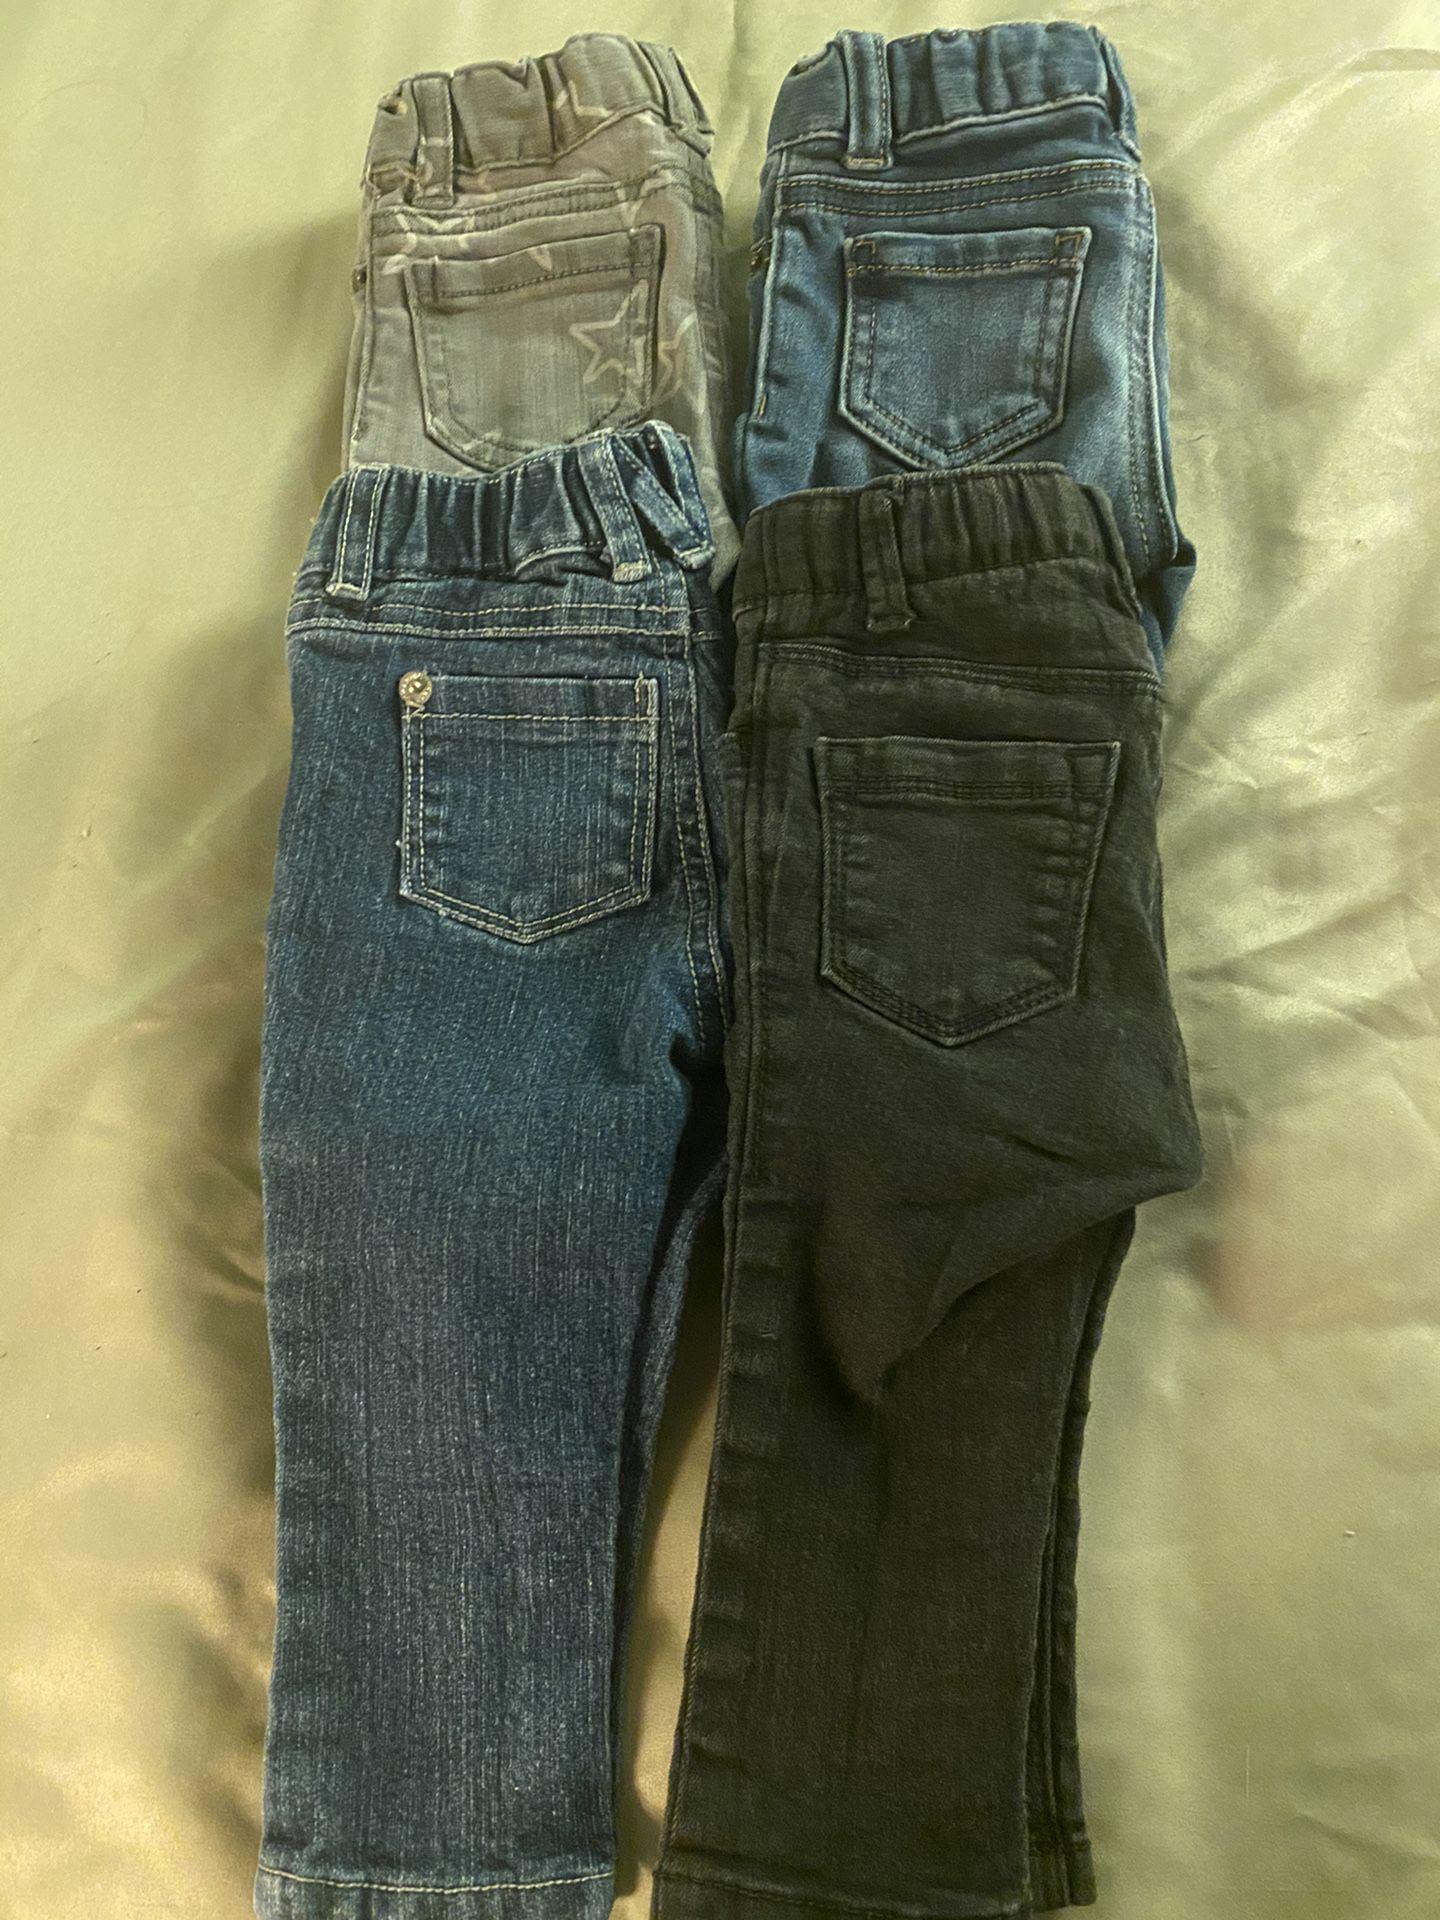 Baby skinny jeans